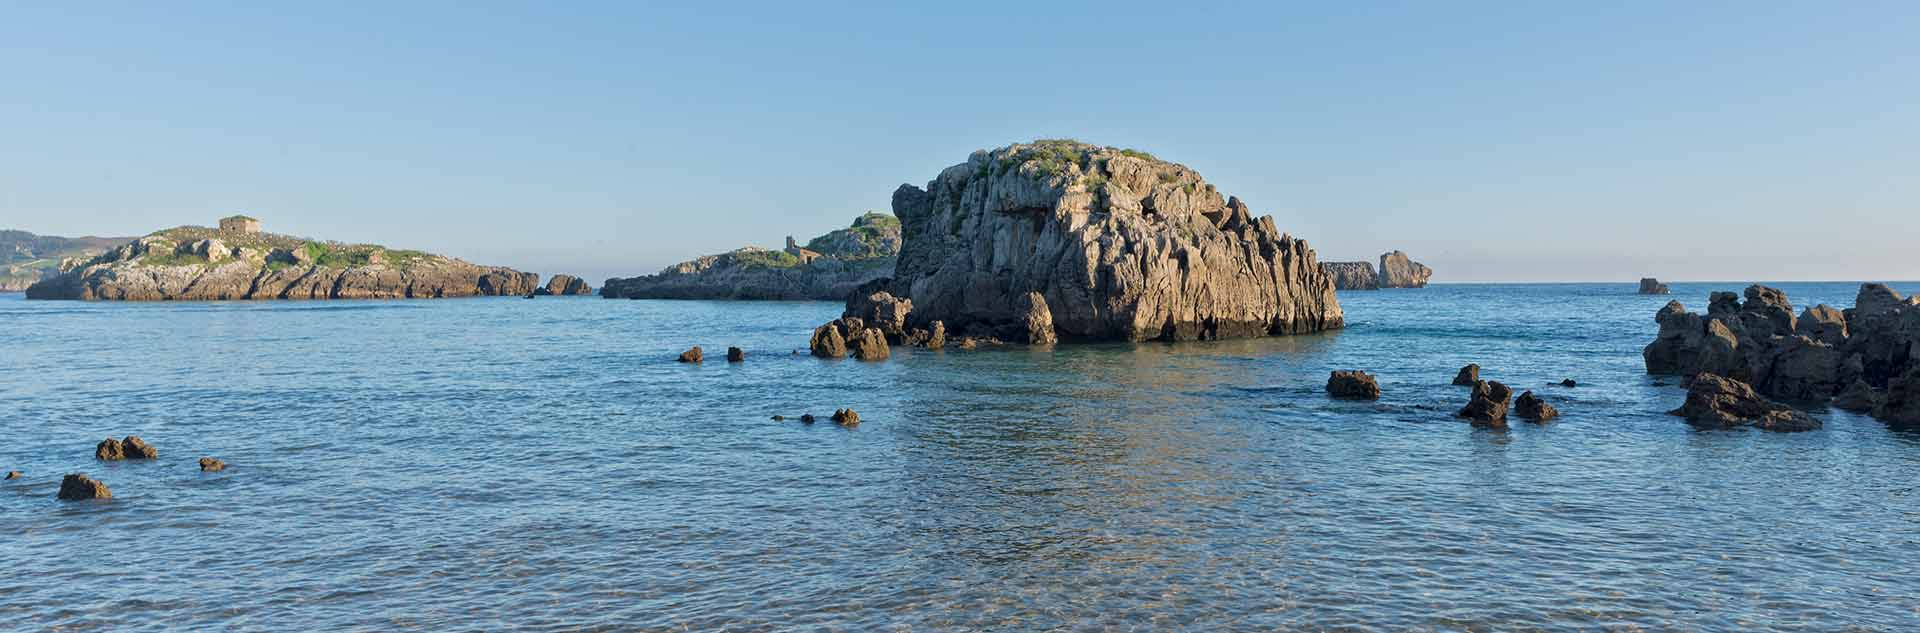 Playa de Ris en Noja, Cantabria